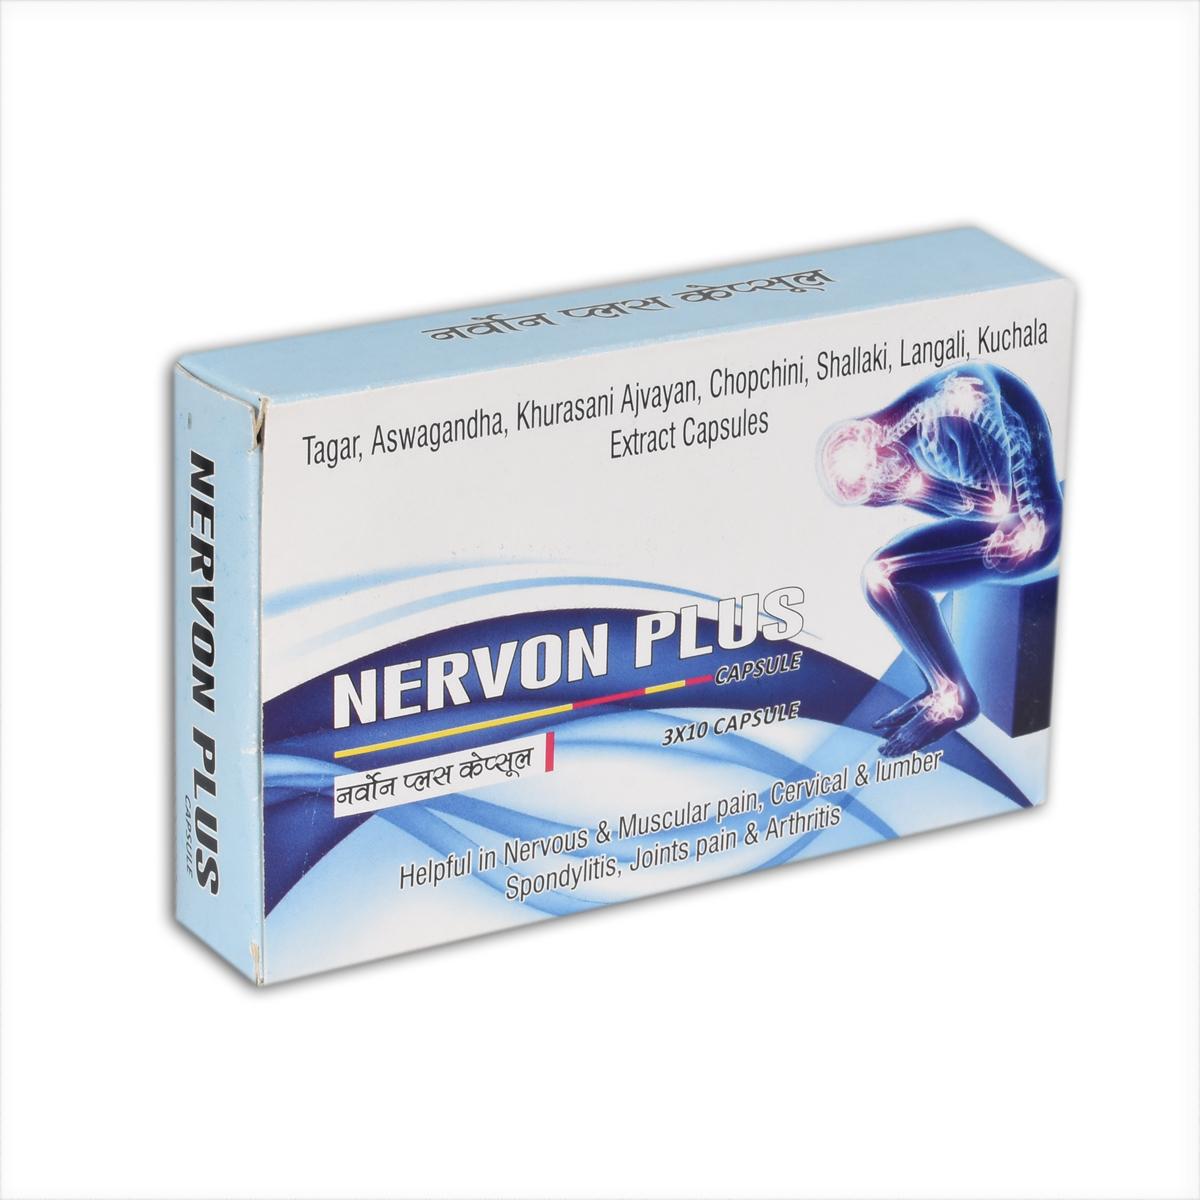 SN Herbals - NERVON PLUS CAPSULE